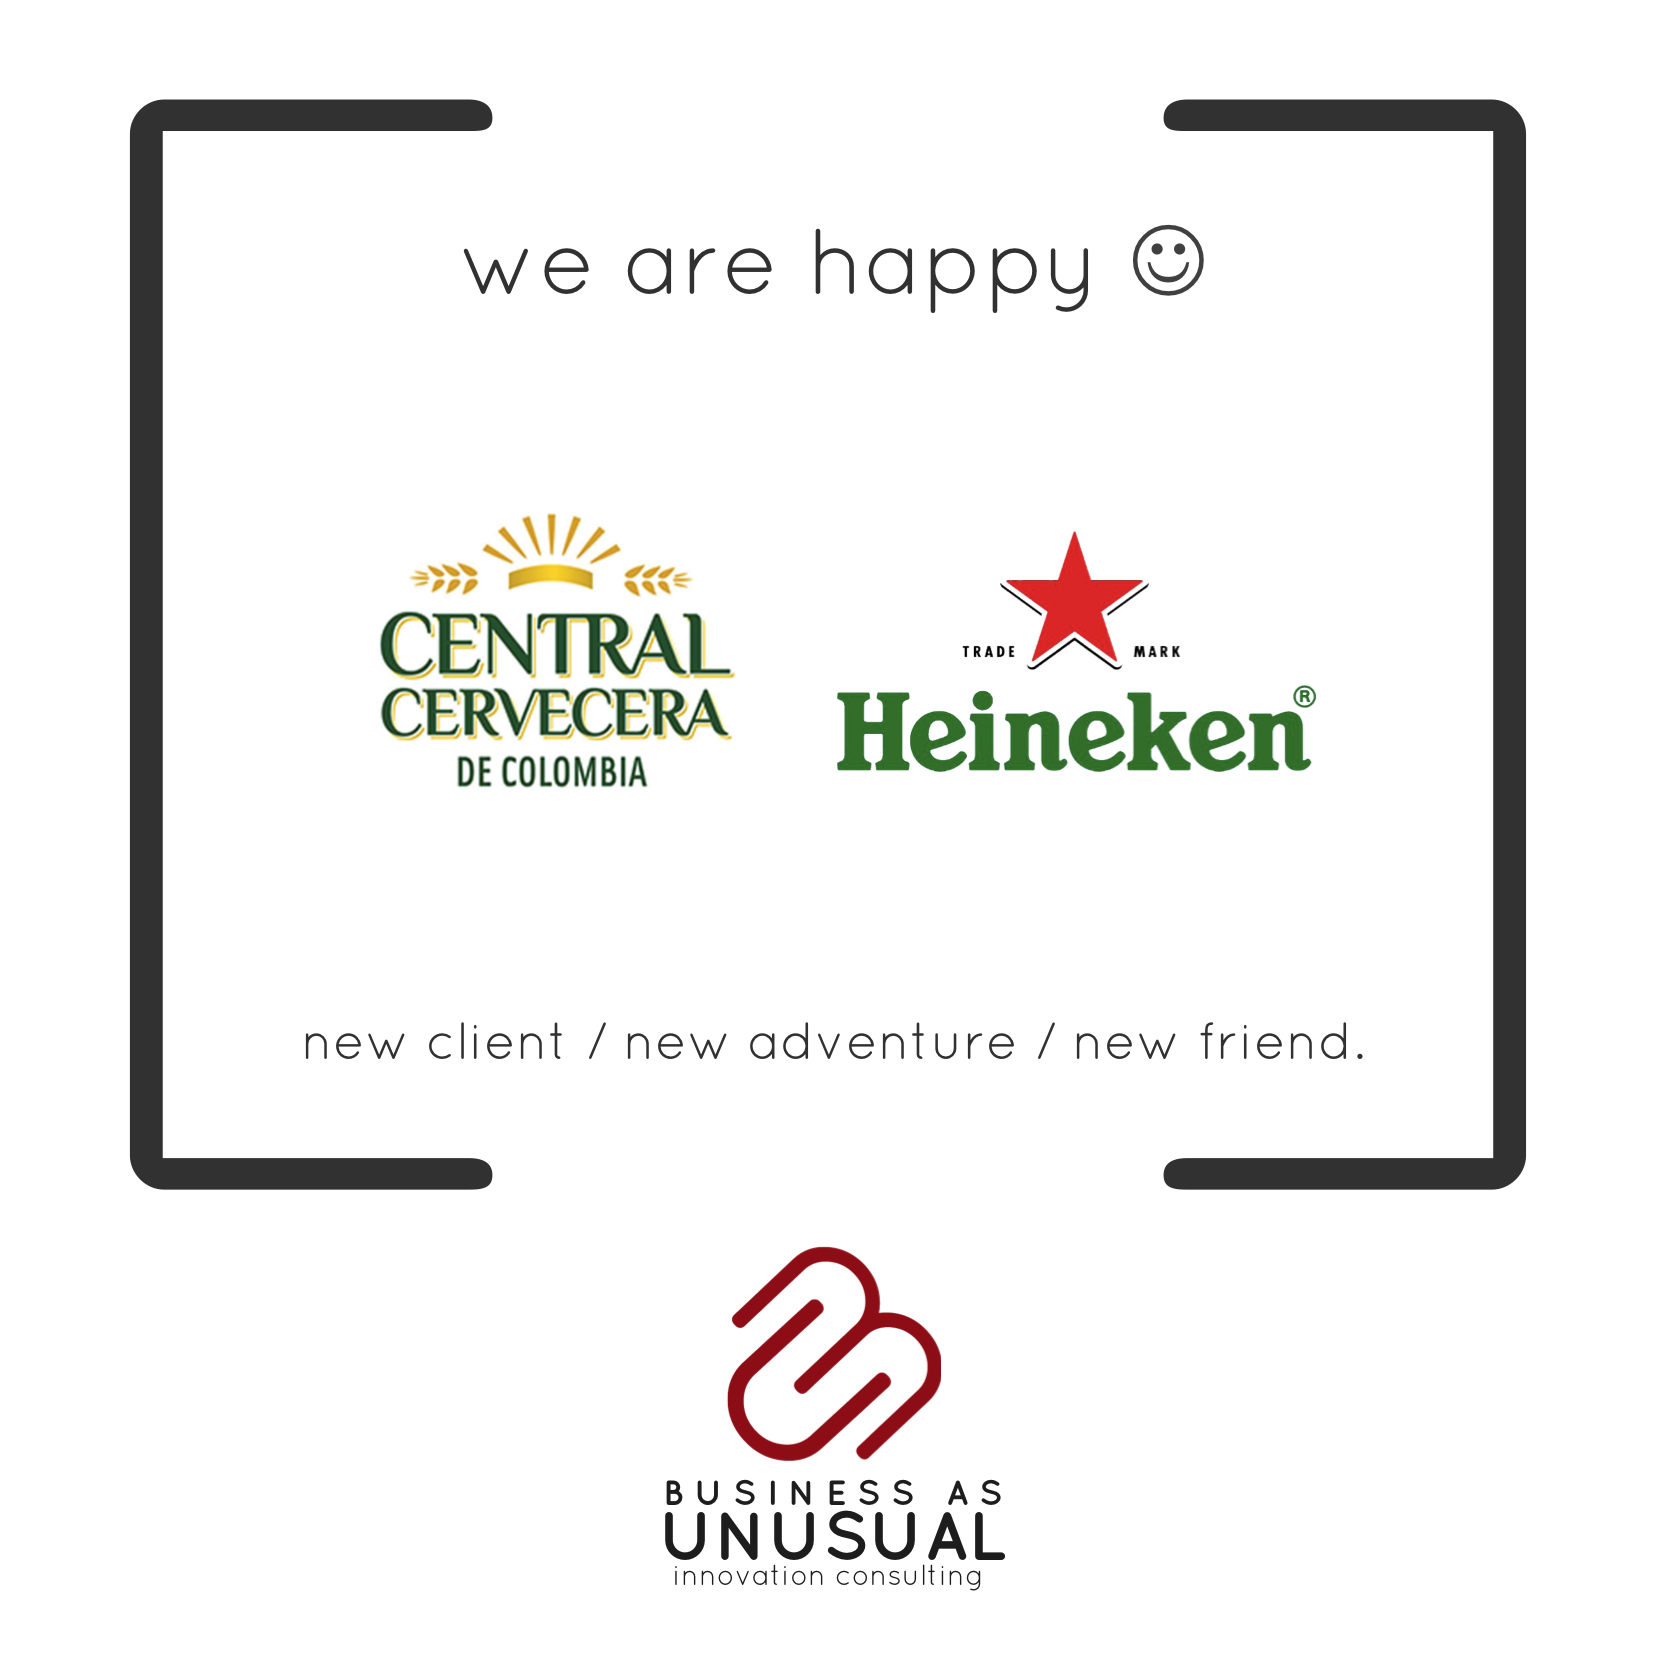 Central Cervecera de Colombia – Heineken